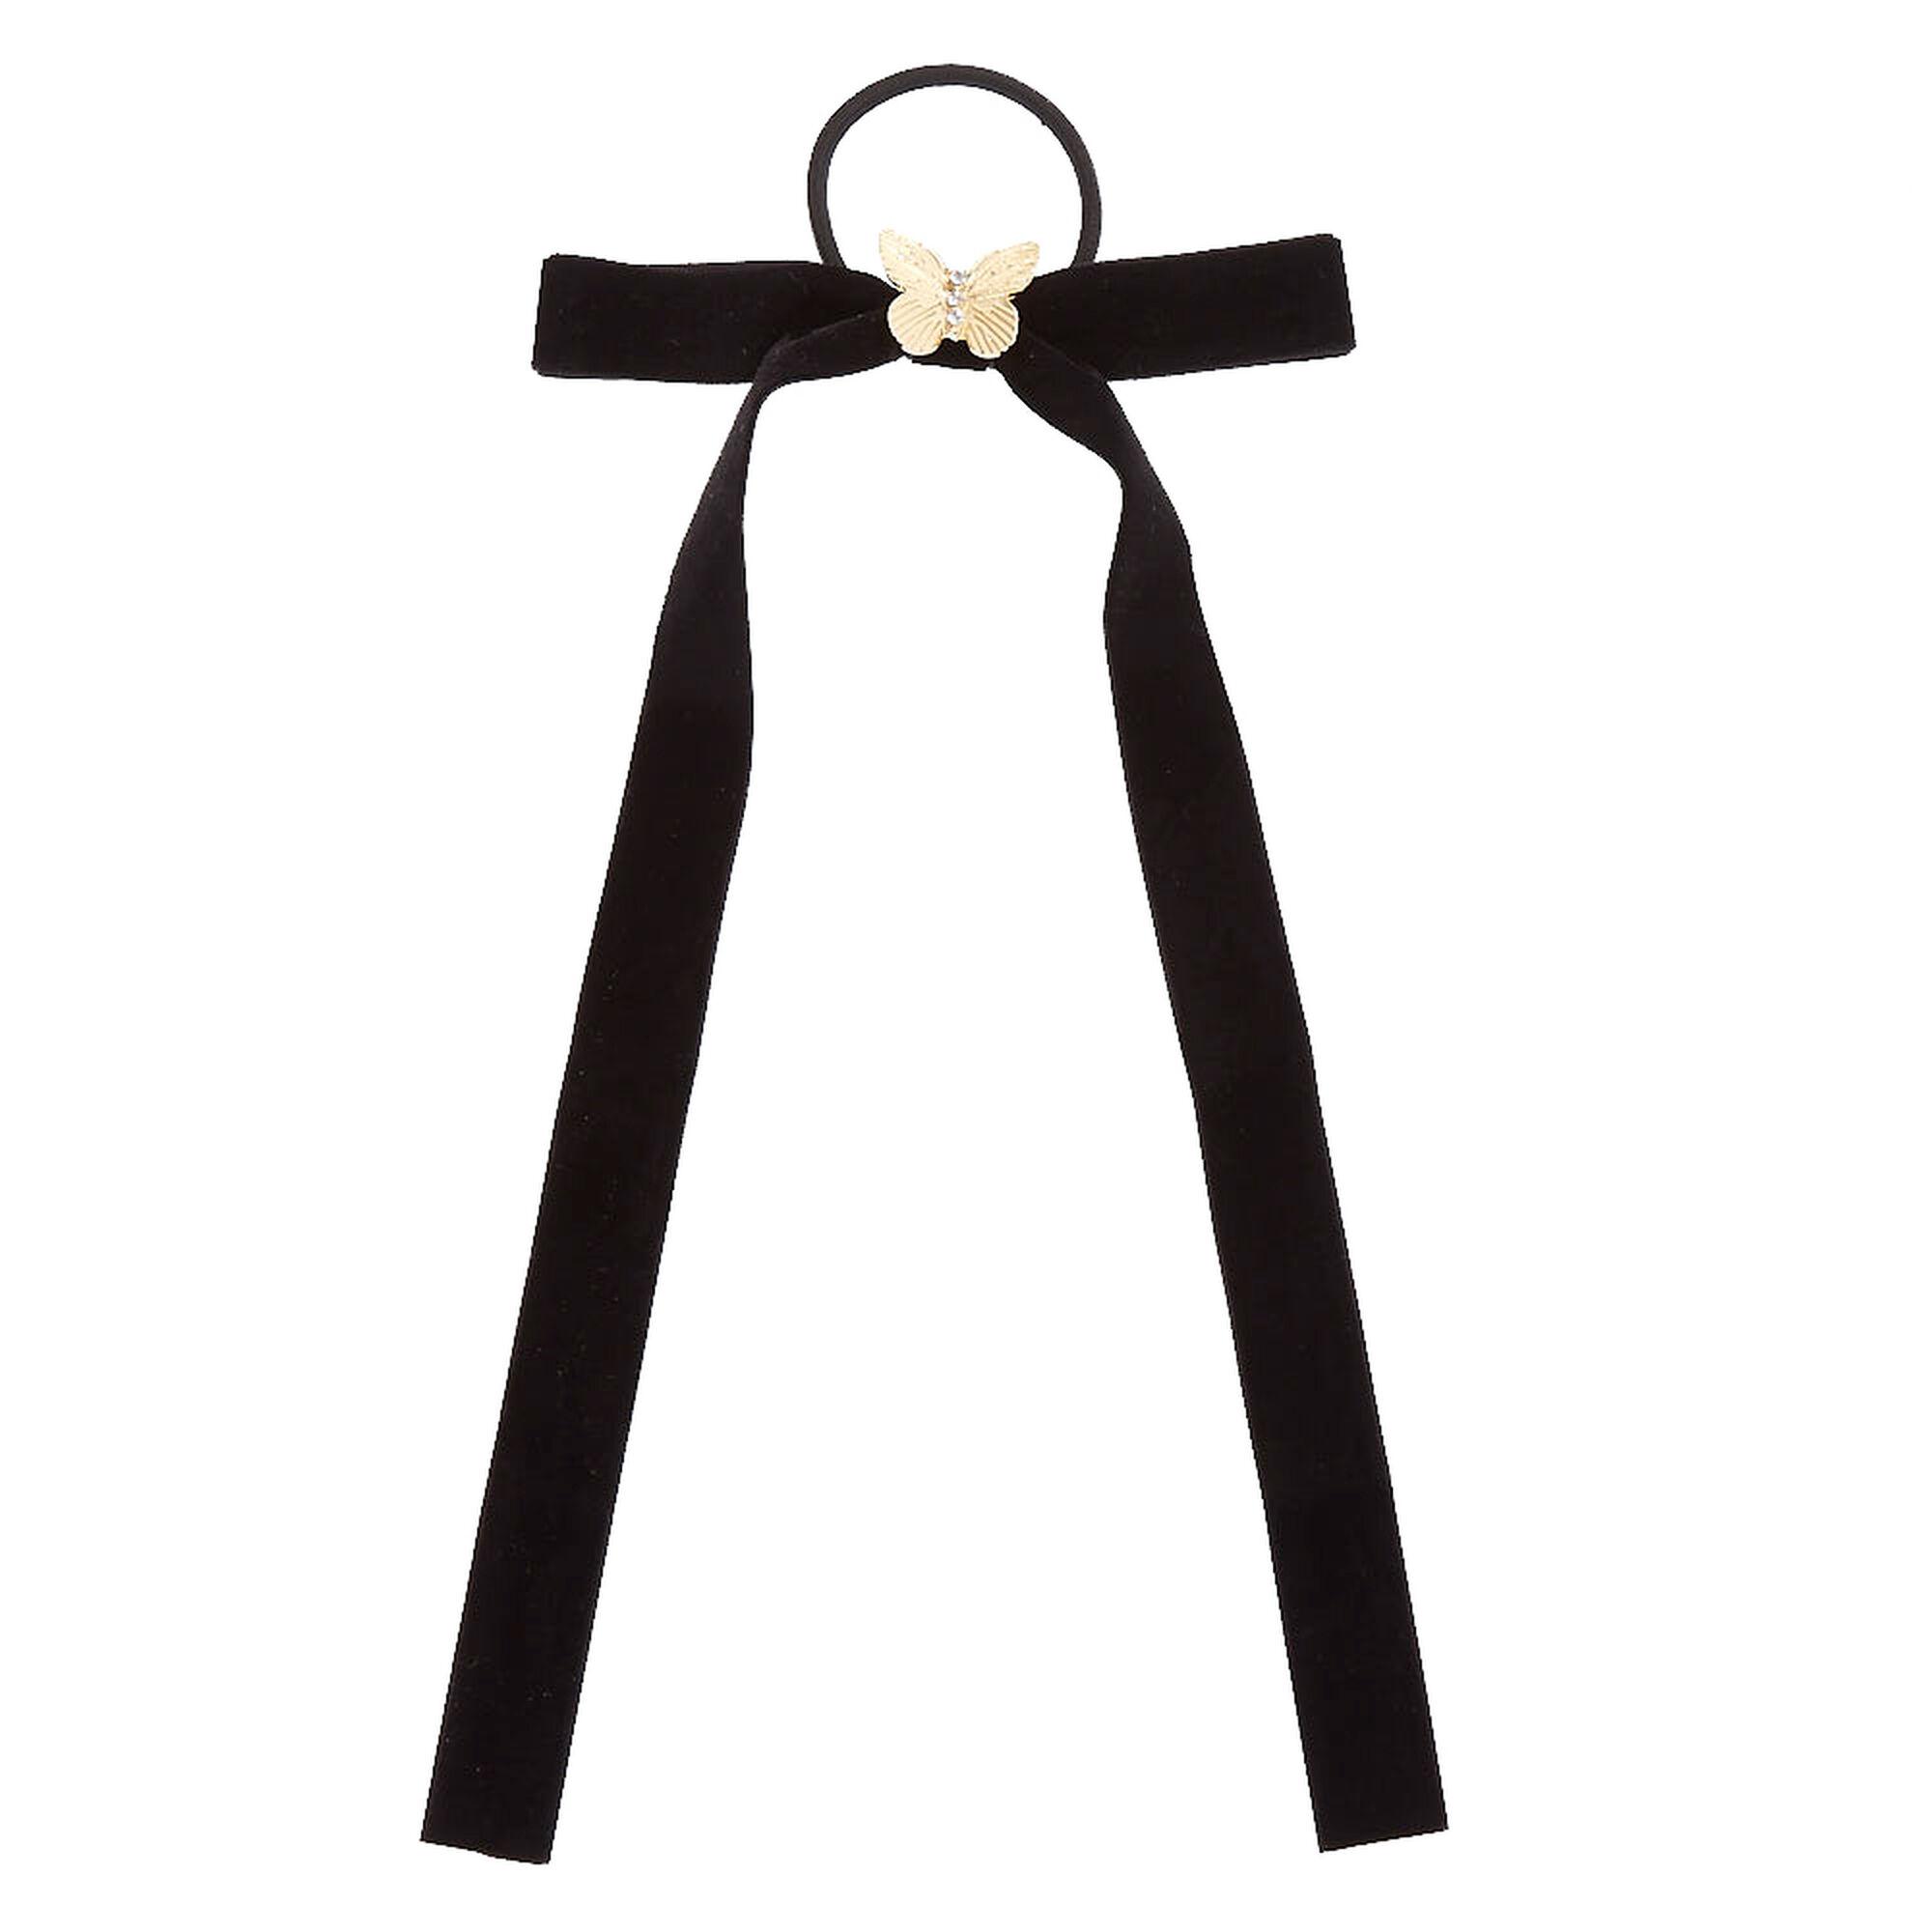 Velvet Bow Hair Tie with Butterfly Charm  eea1b404b84